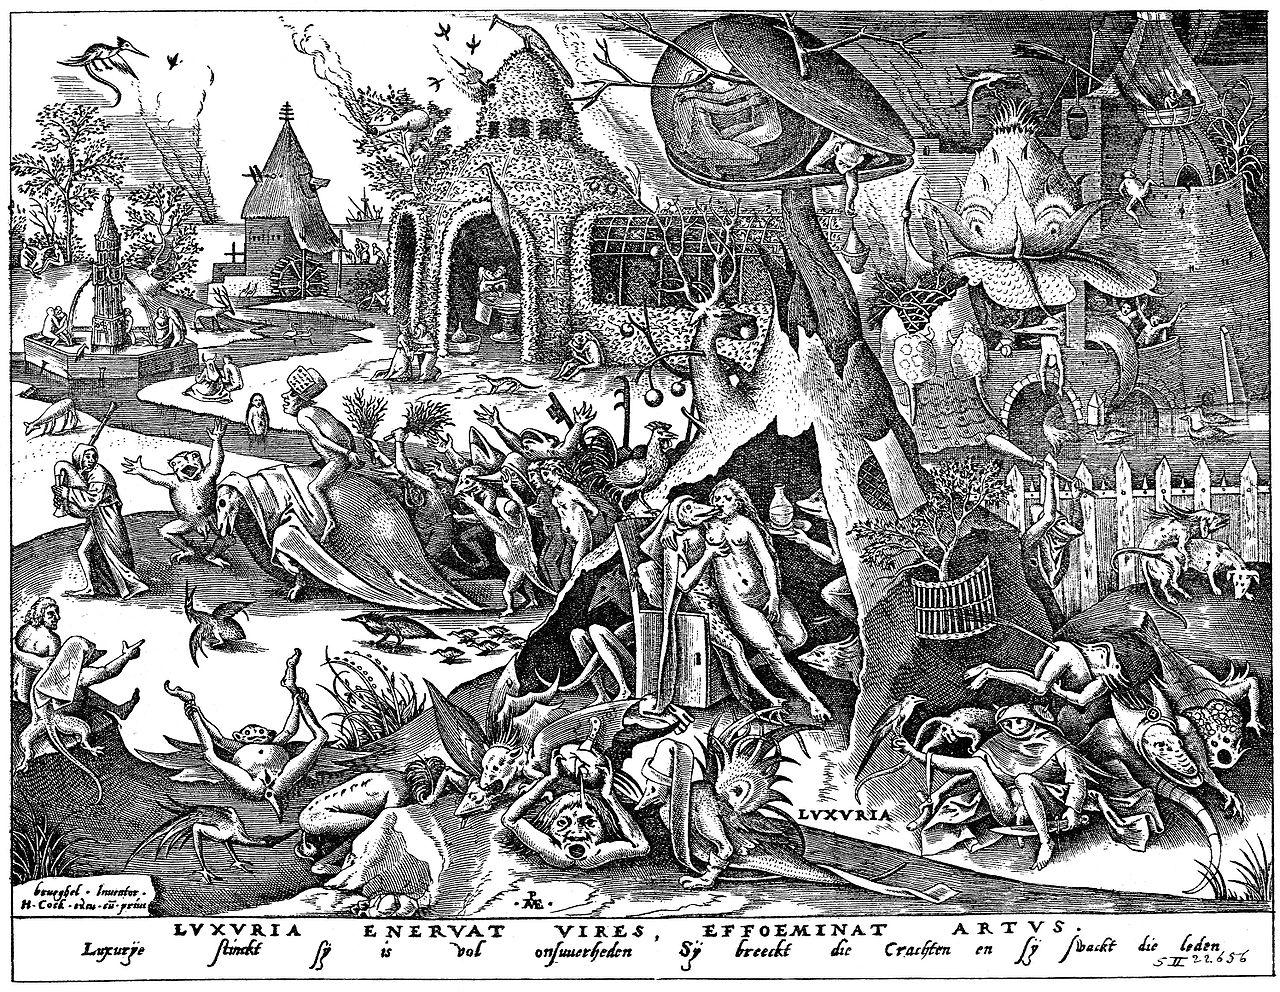 https://upload.wikimedia.org/wikipedia/commons/thumb/3/3d/Brueghel_-_Sieben_Laster_-_Luxuria.jpg/1280px-Brueghel_-_Sieben_Laster_-_Luxuria.jpg